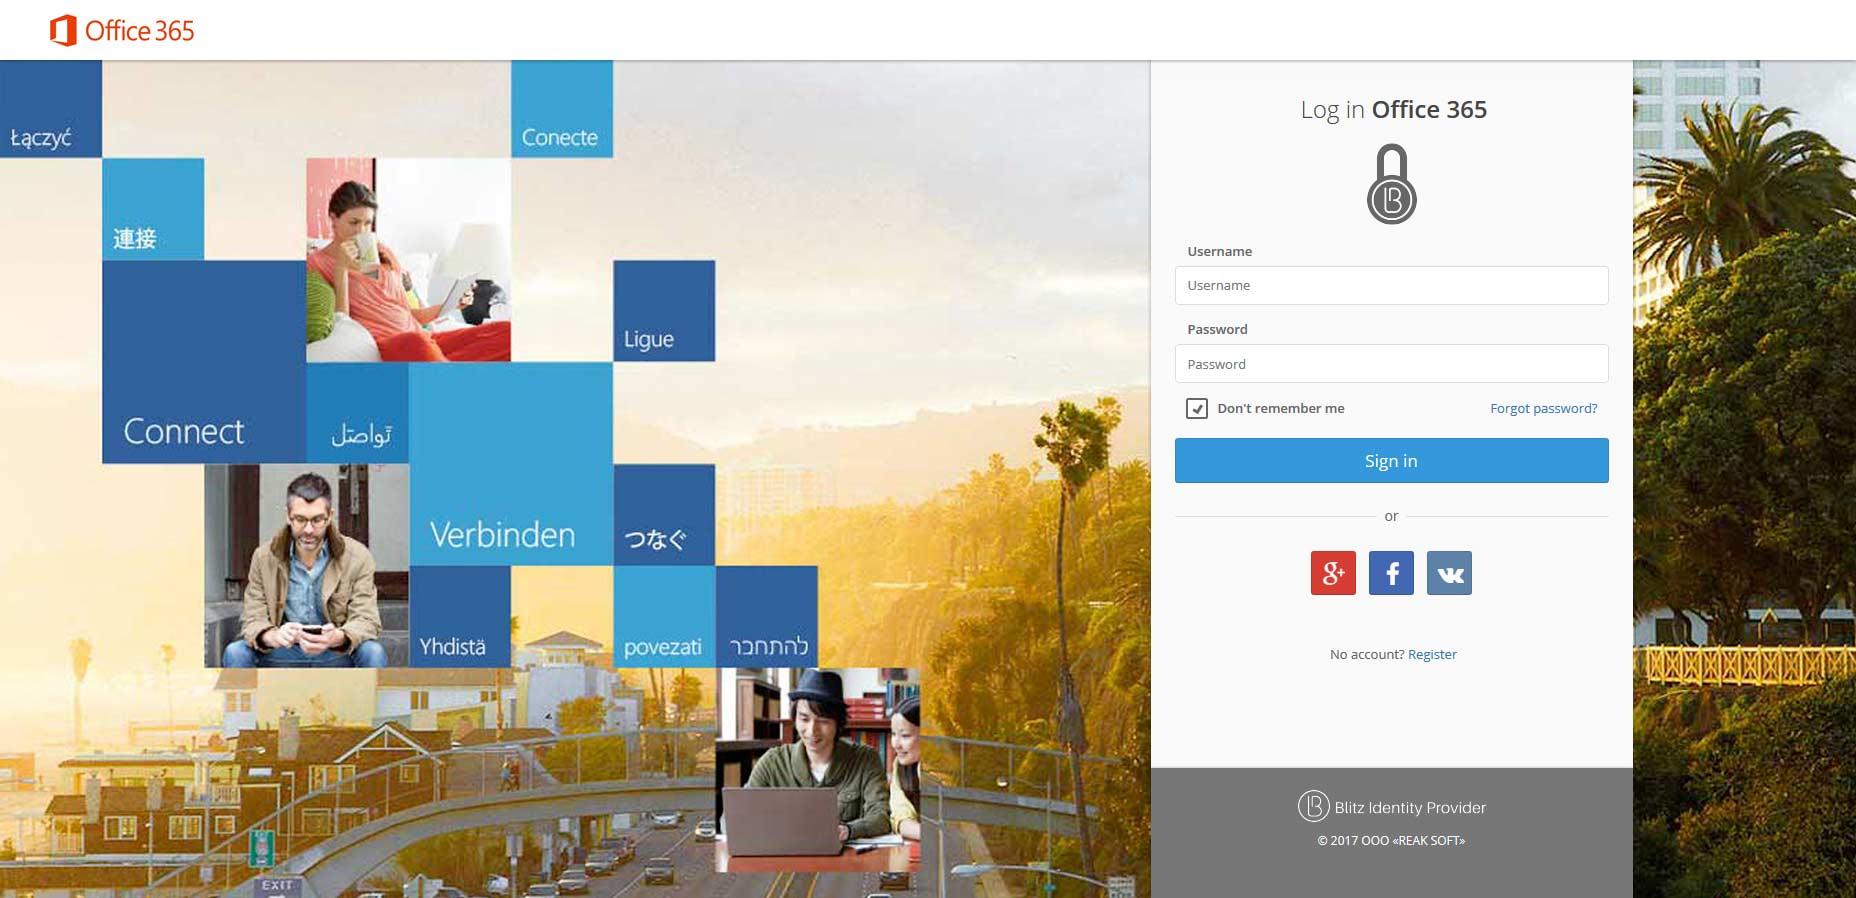 User Interface Customization - Unique design for each application